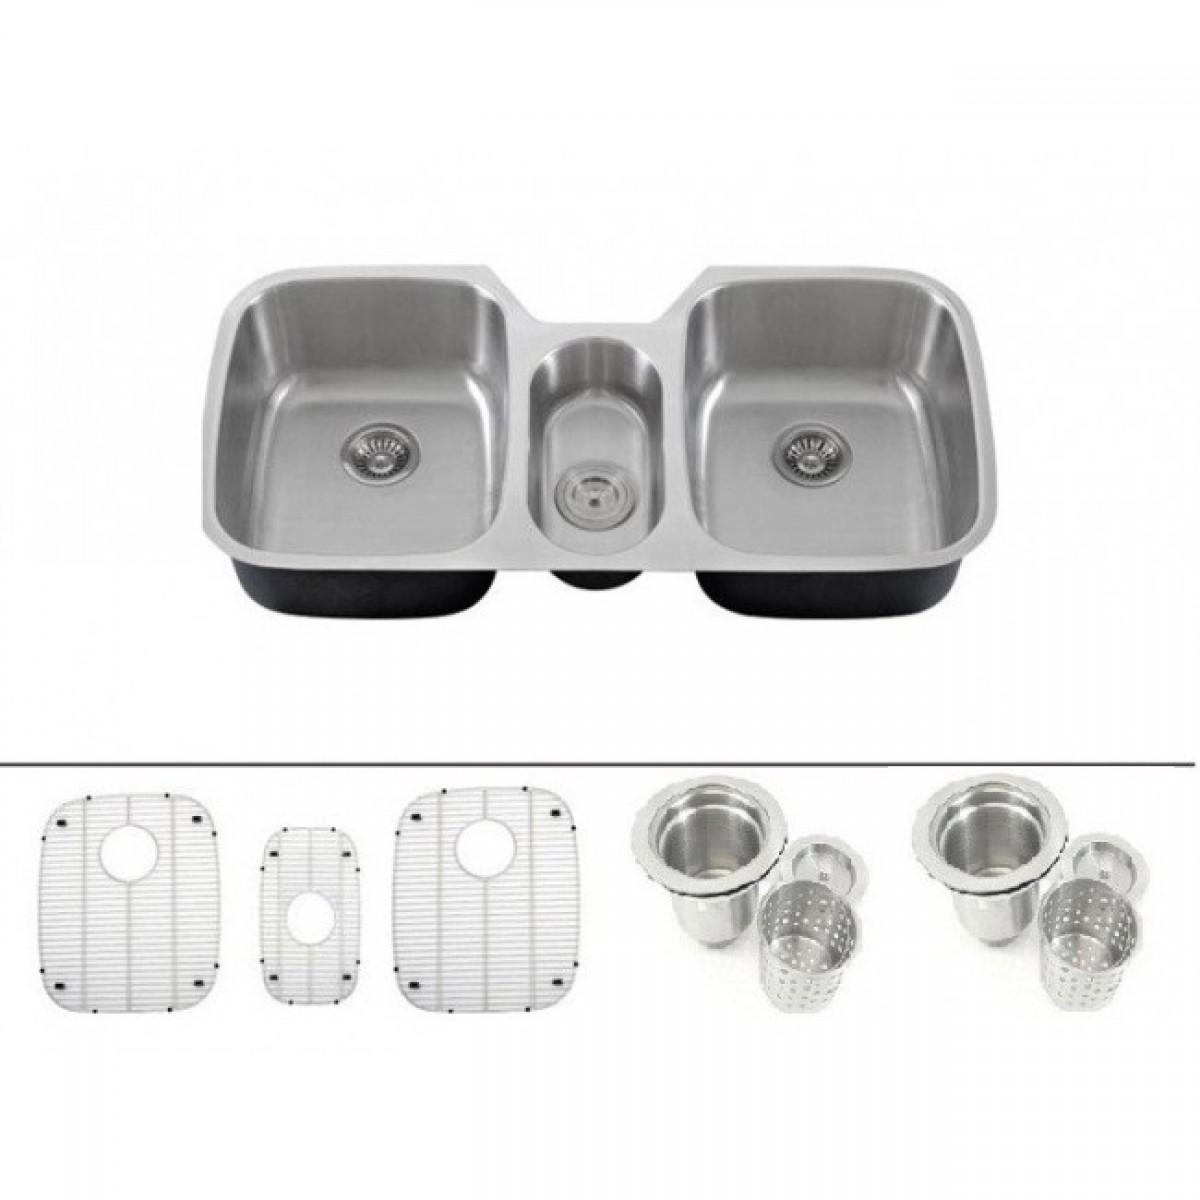 43 inch 16 gauge stainless steel undermount triple bowl kitchen sink with free accessories 43 inch 16 gauge stainless steel undermount triple bowl kitchen      rh   emoderndecor com